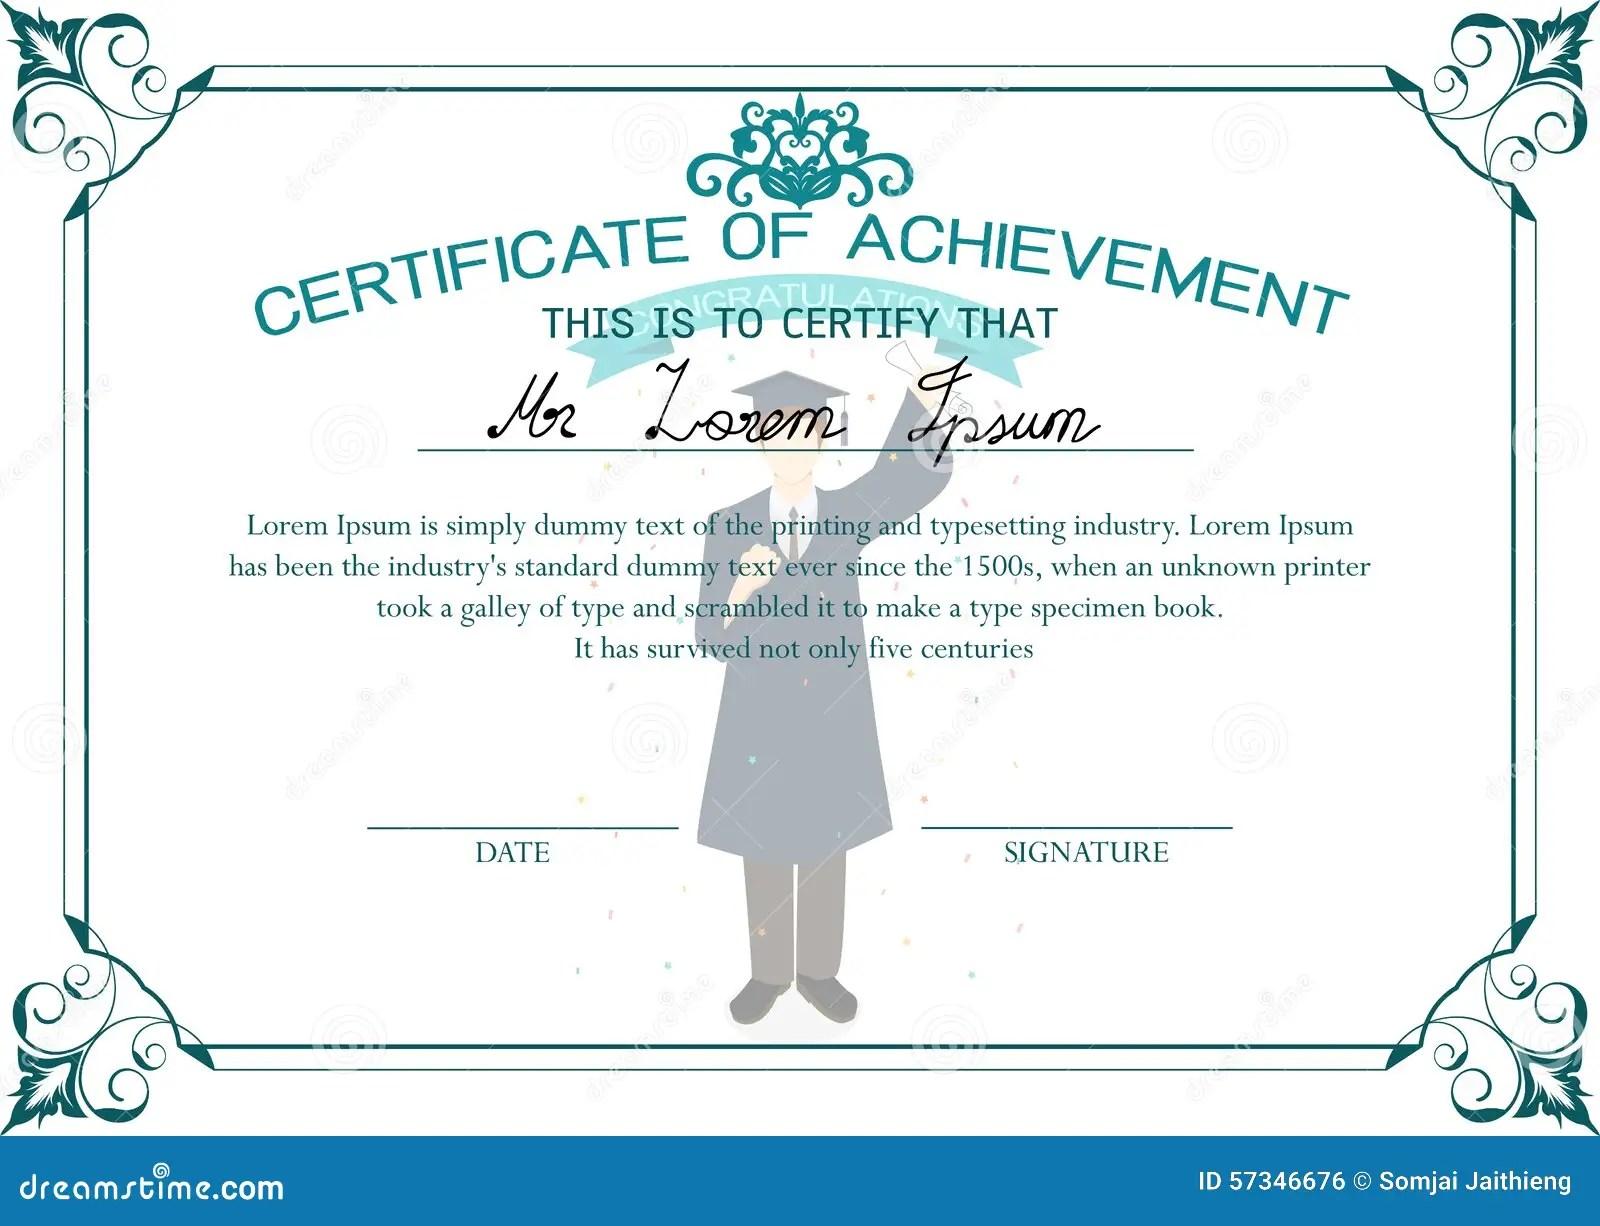 100 Blank Certificate Templates Awards Certificates